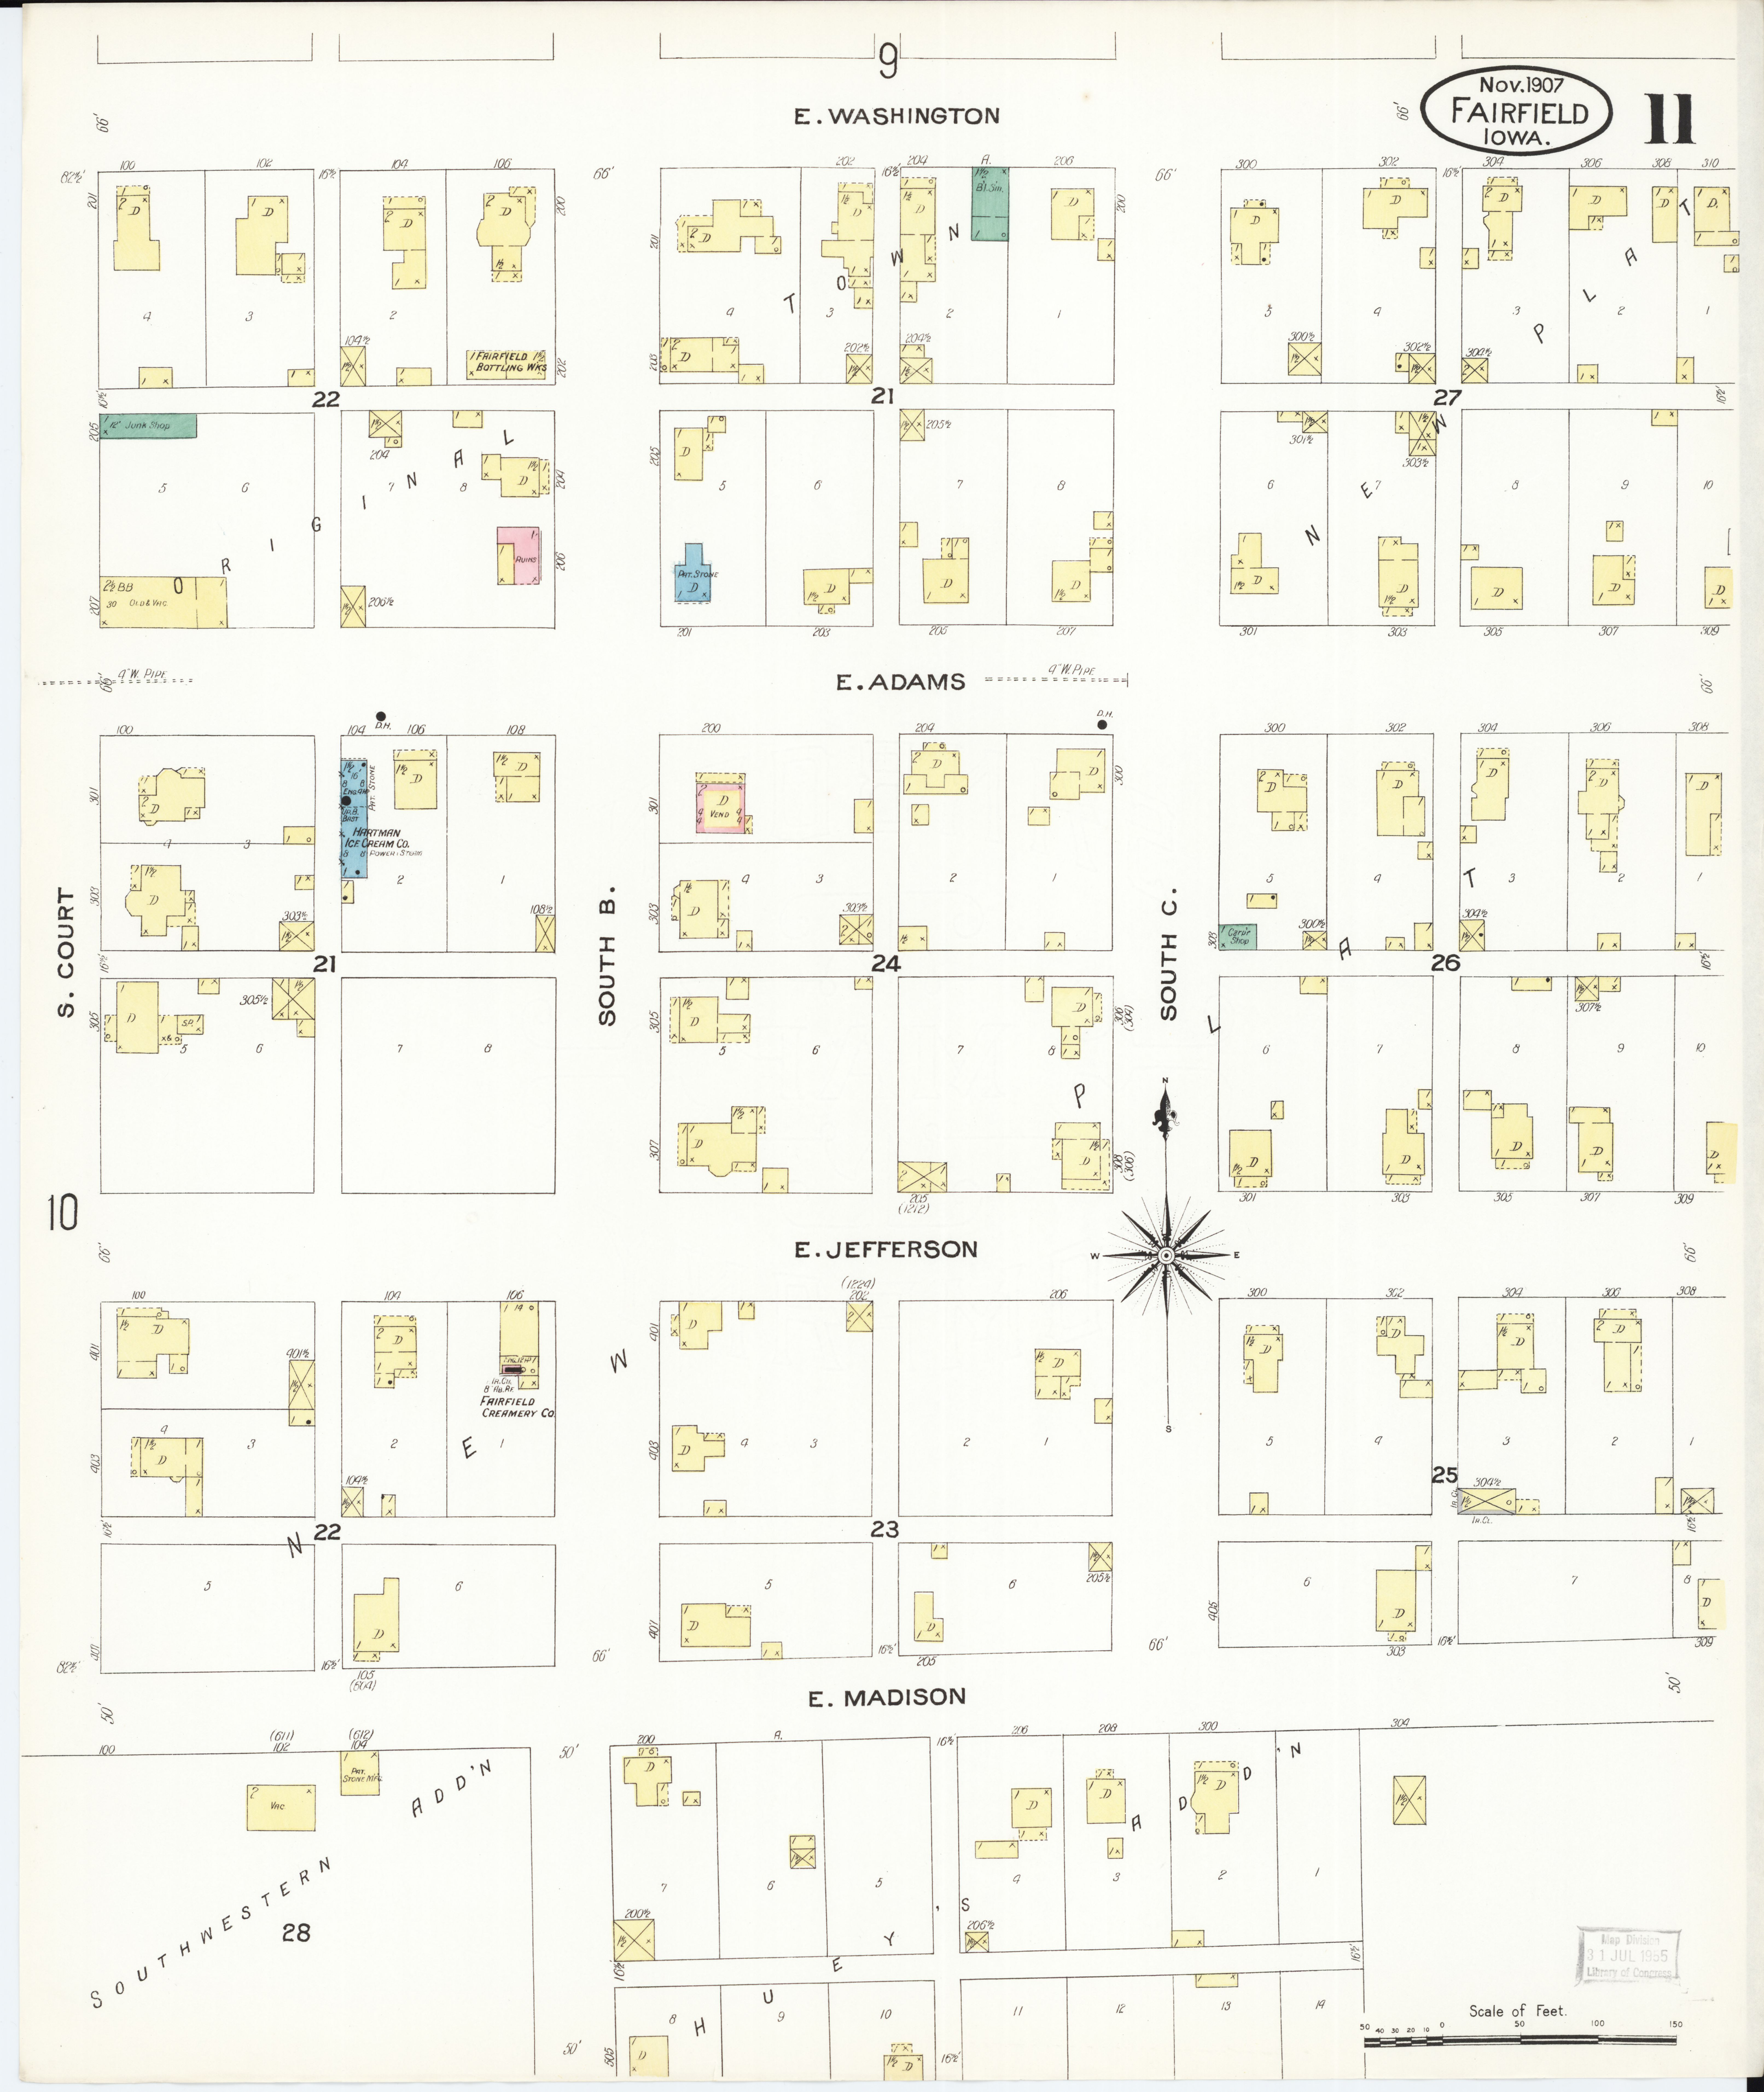 Jefferson County Iowa Map.File Sanborn Fire Insurance Map From Fairfield Jefferson County